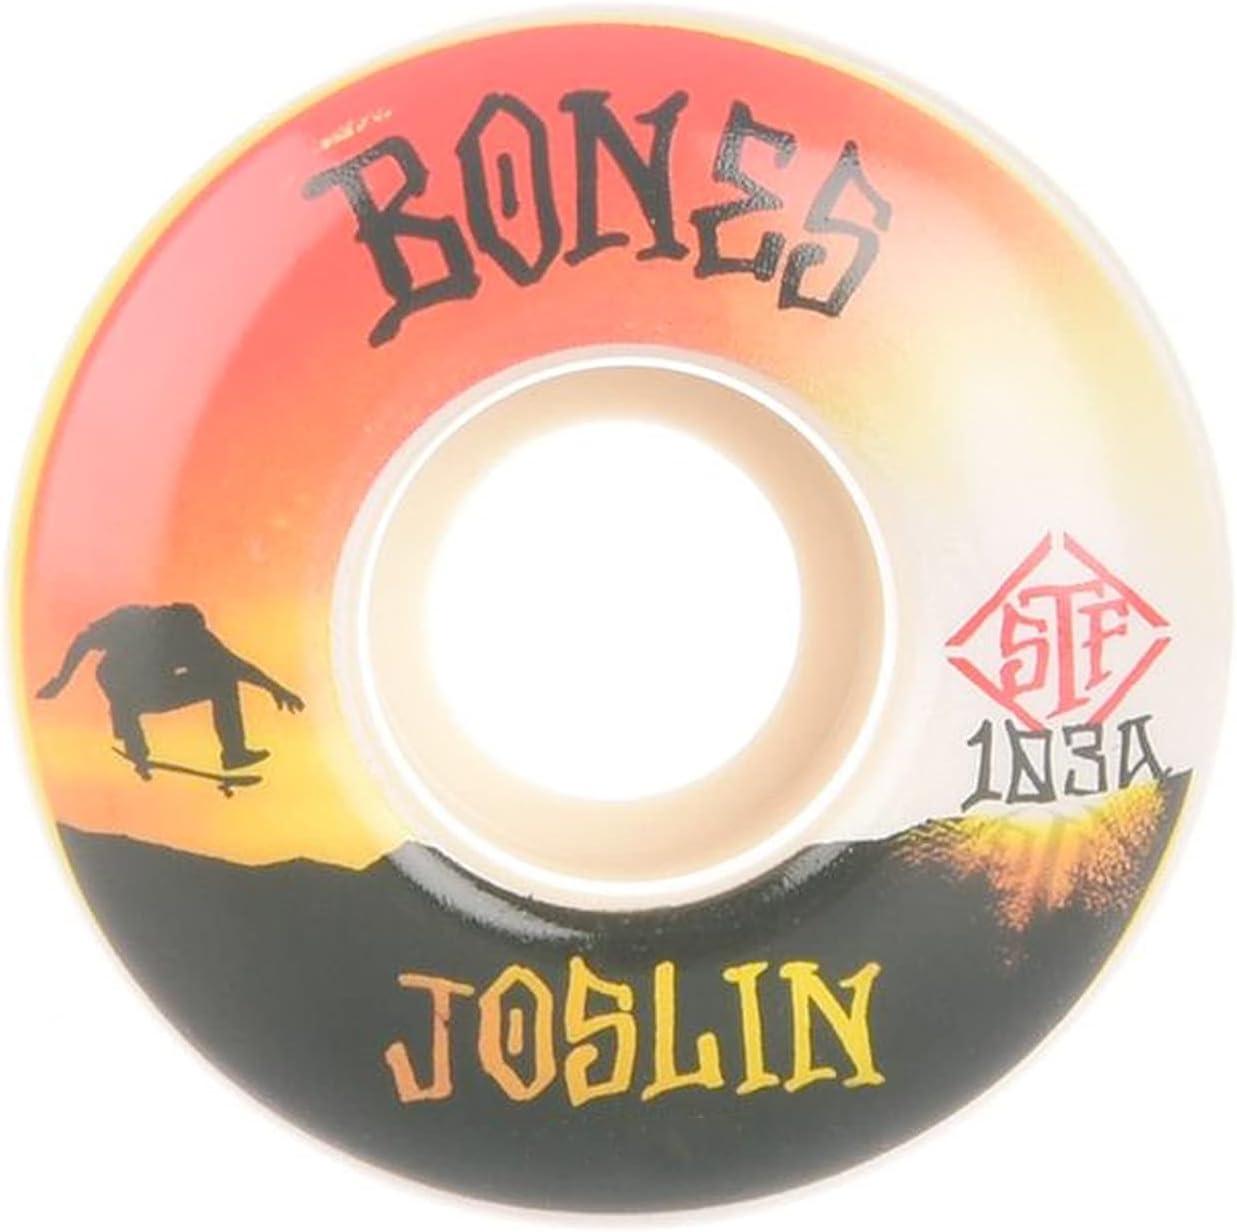 Bones Skateboard Wheels 54mm Joslin 55% OFF Standard 103A STF V1 Sunset Award